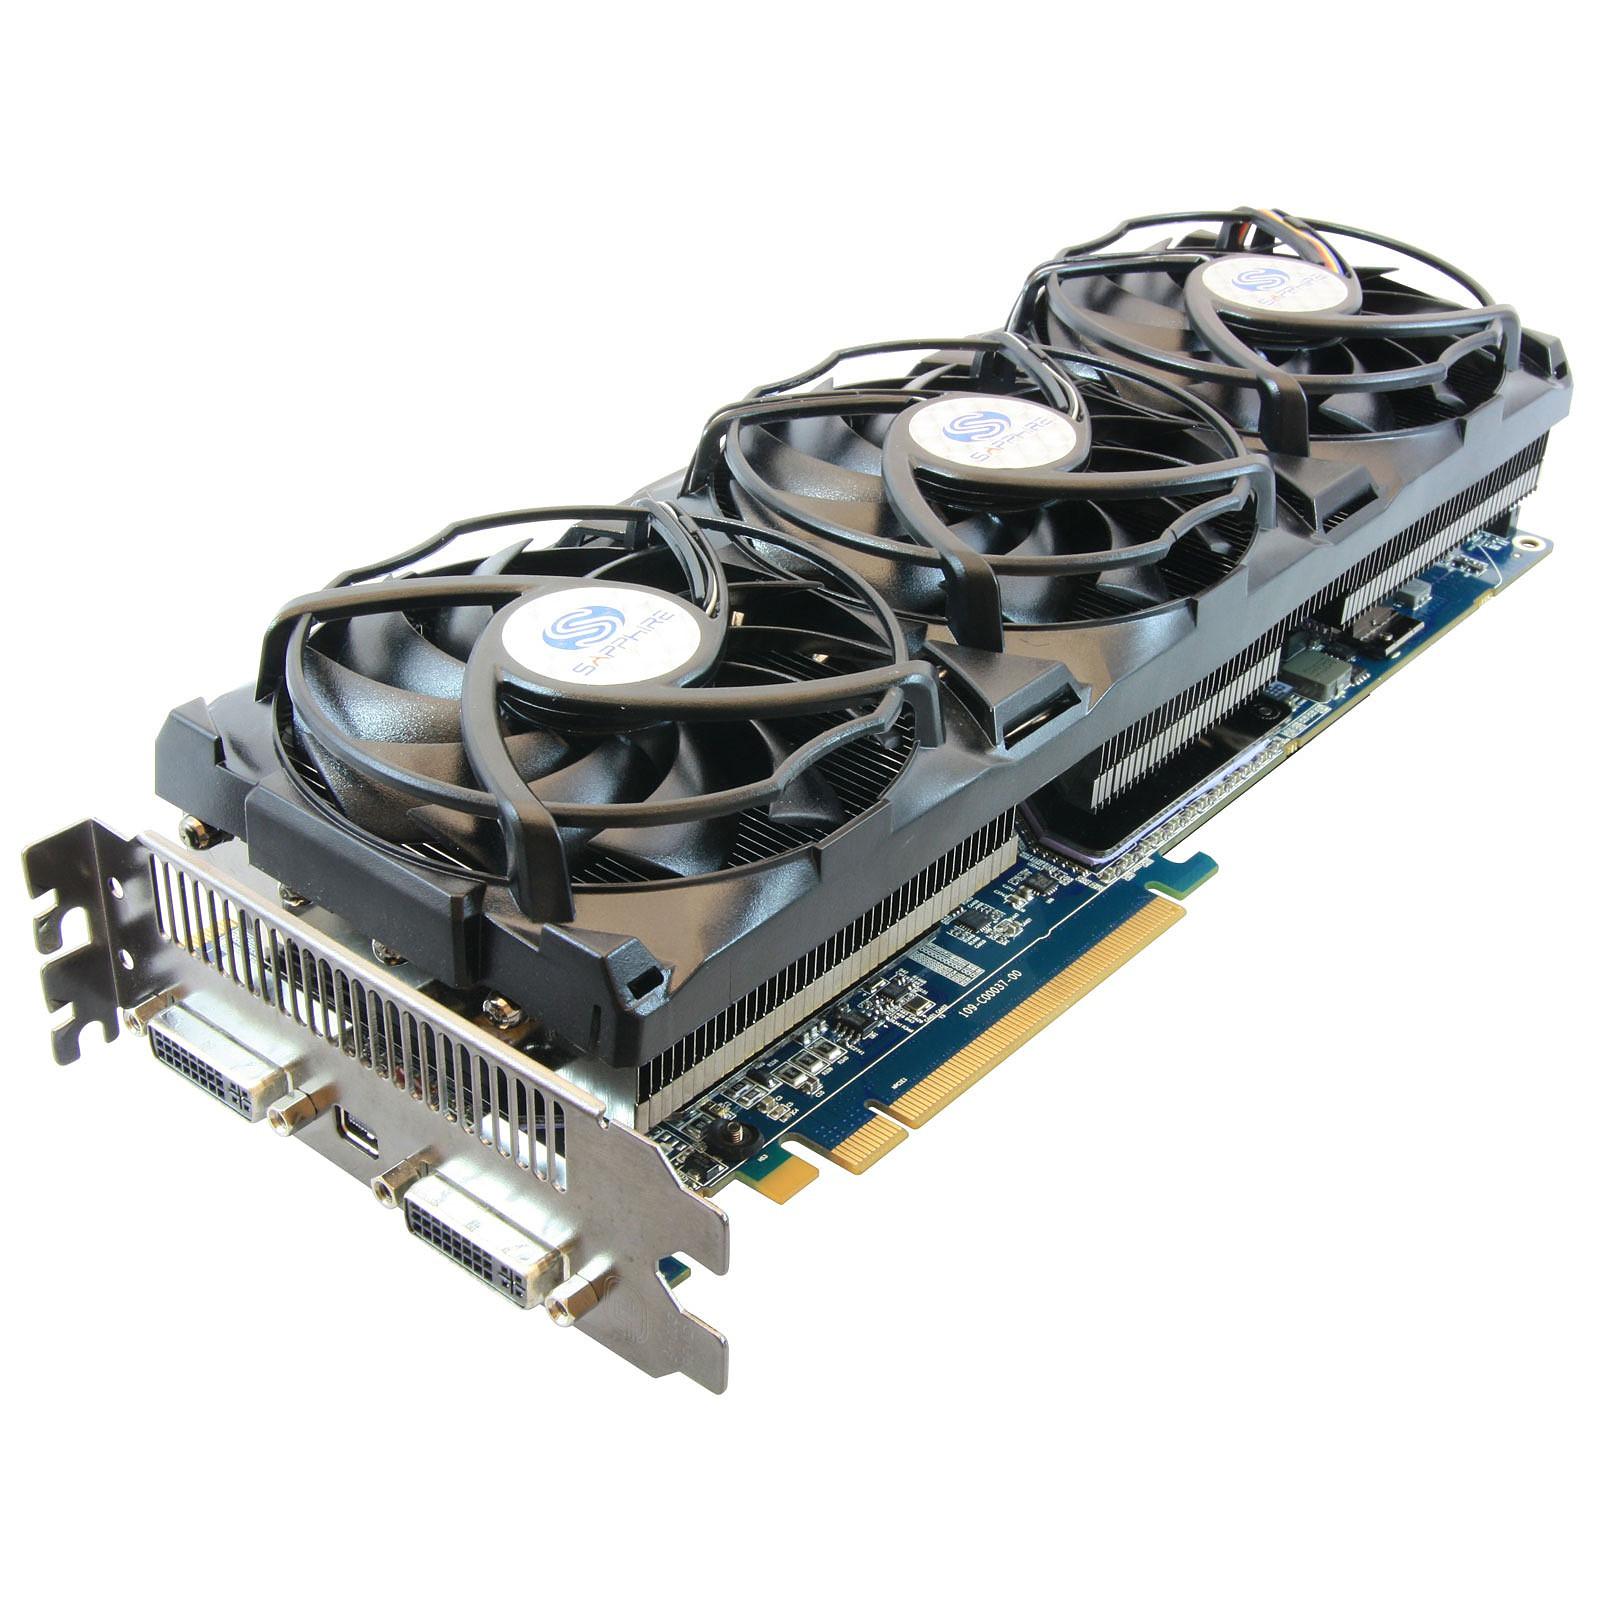 Sapphire Radeon HD 5970 TOXIC 4 GB